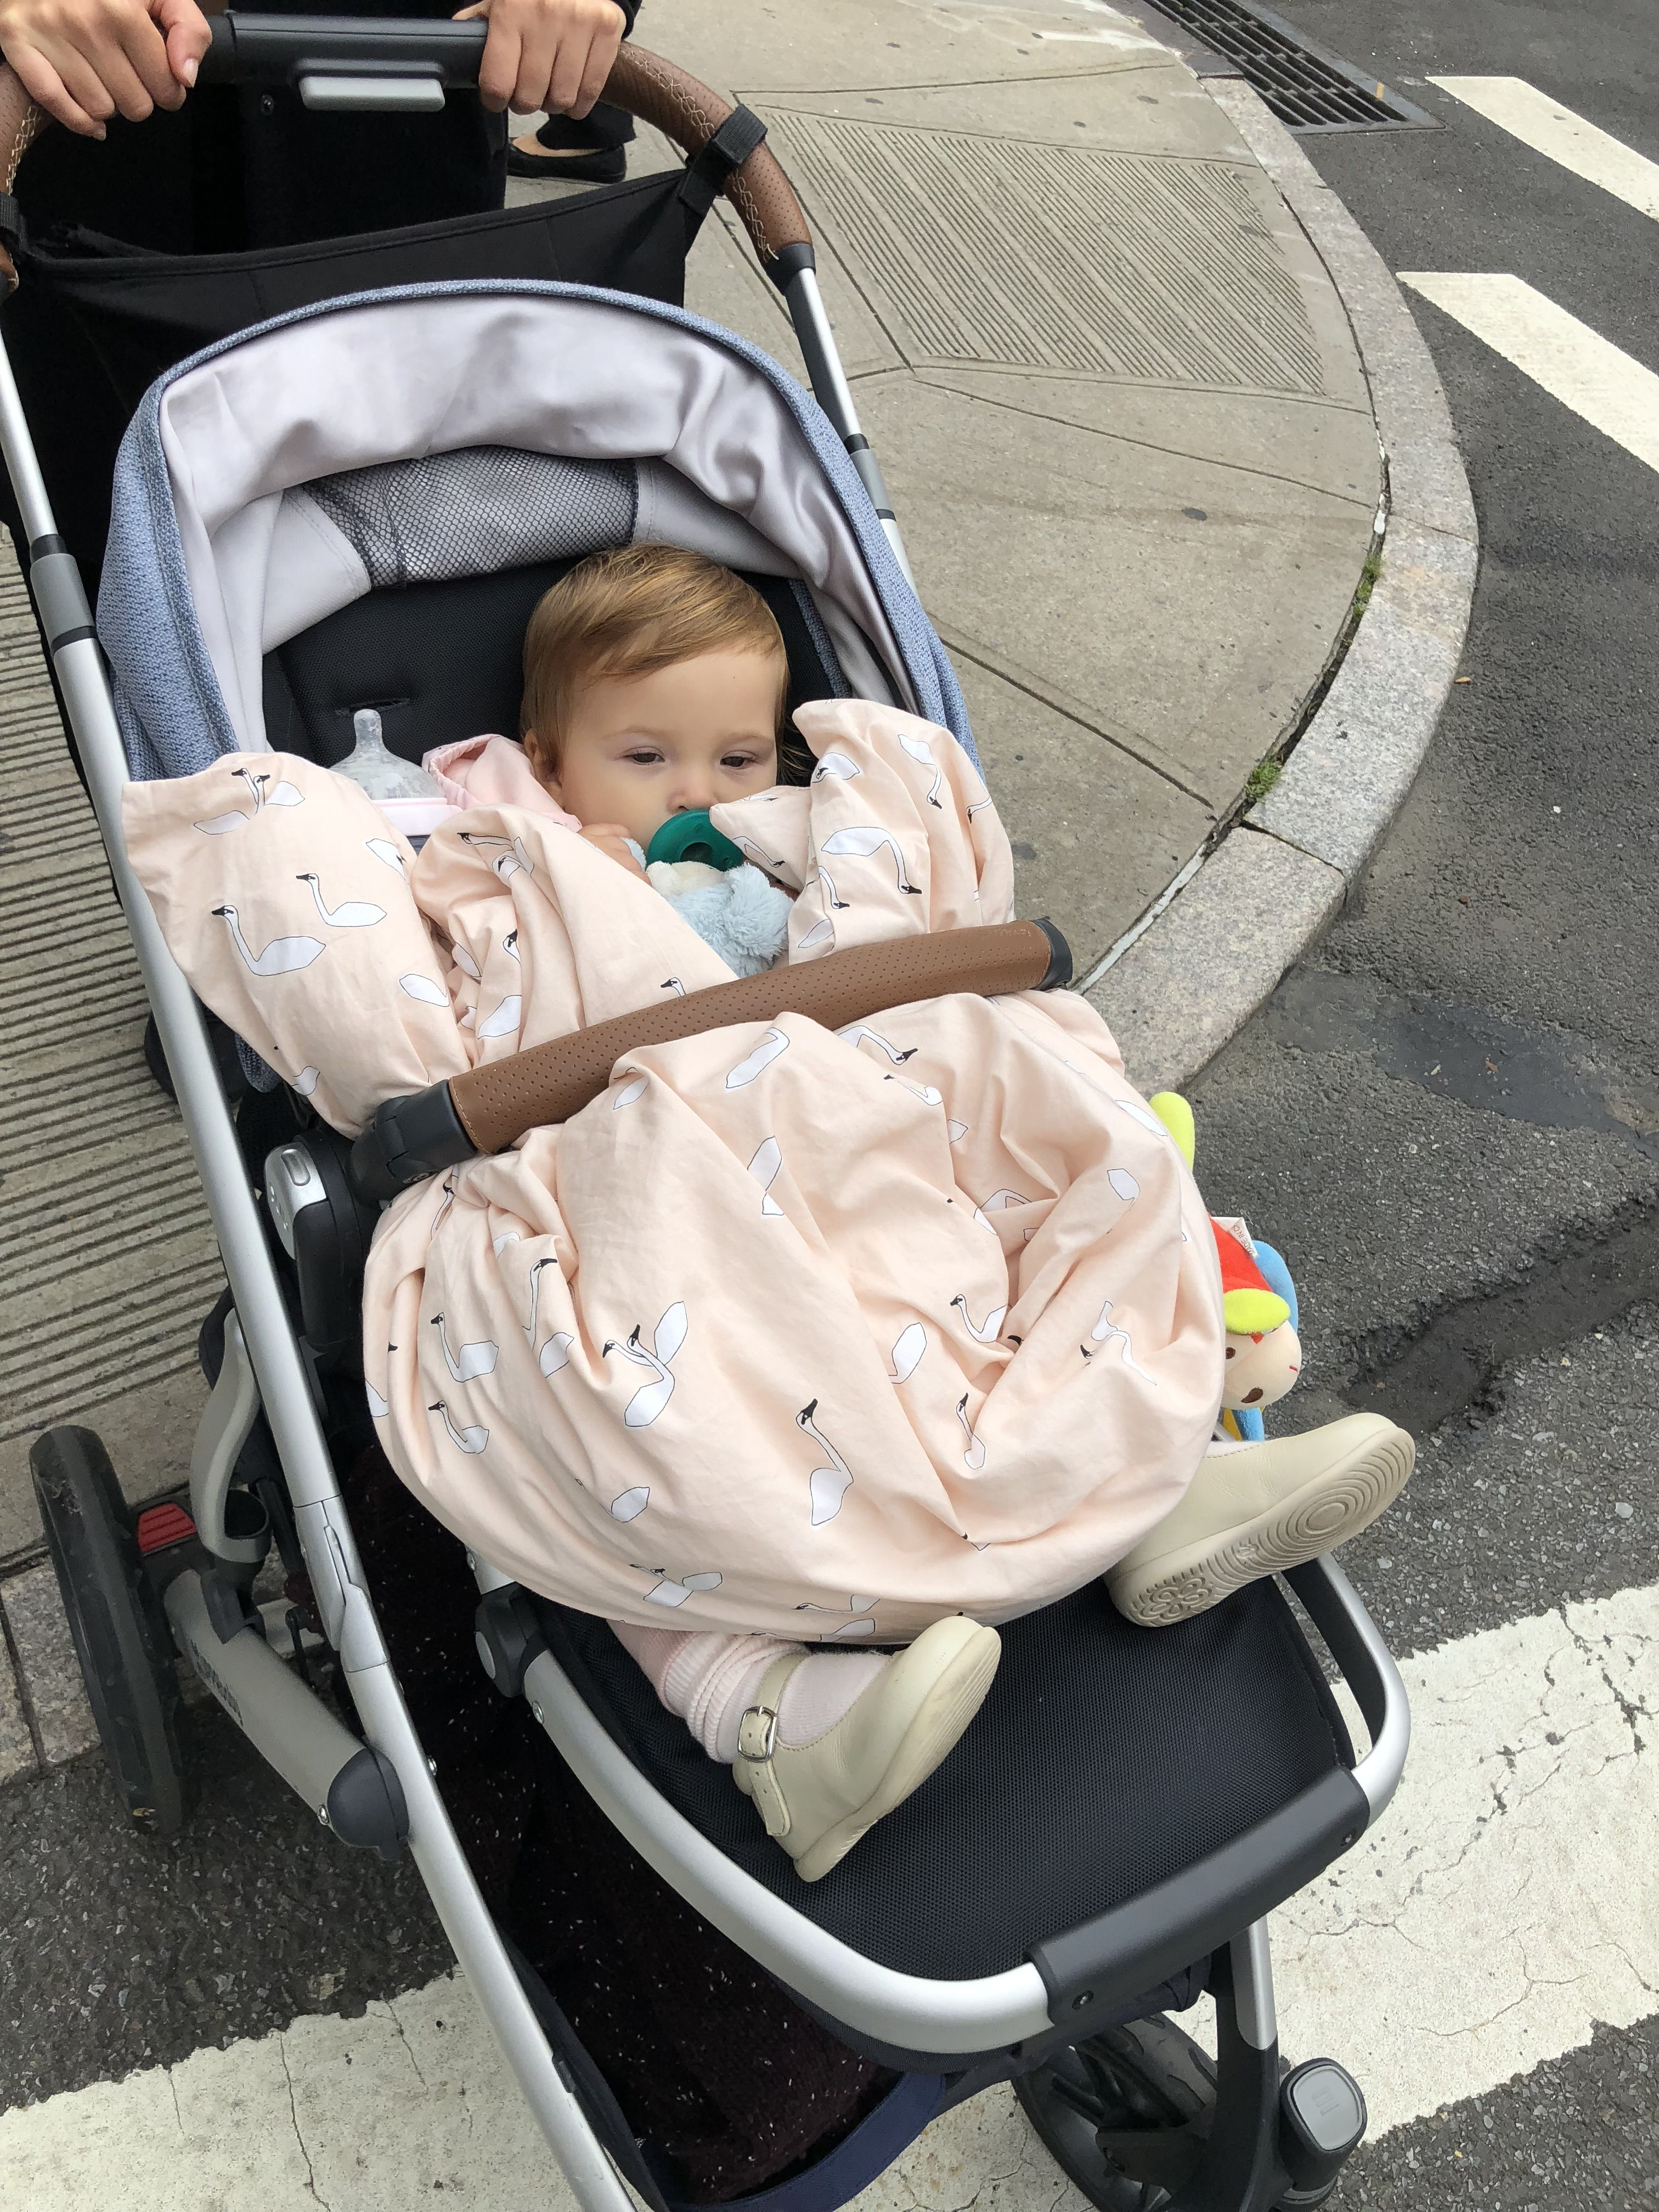 Pin by Elana Degnbol on Gooselings | Baby strollers, Baby ...